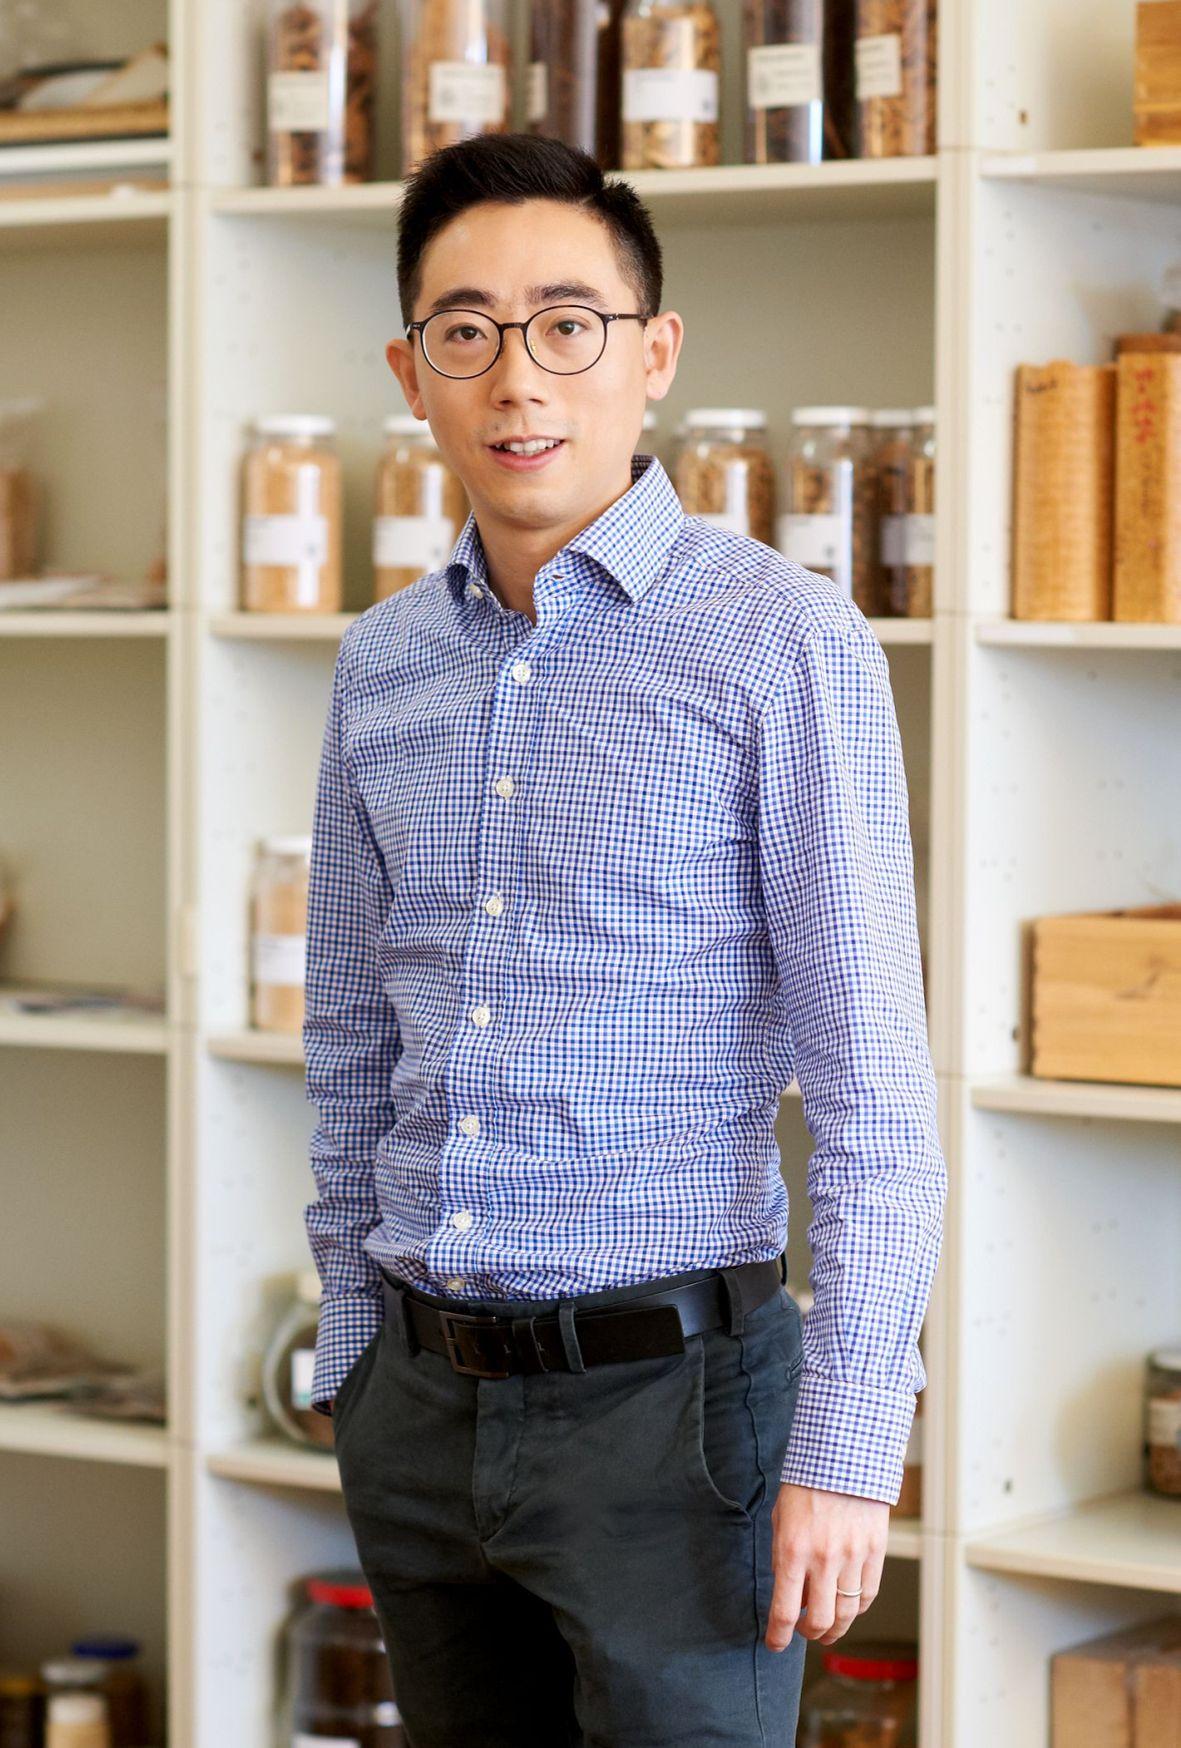 eta-Experte Shiliang Zhao